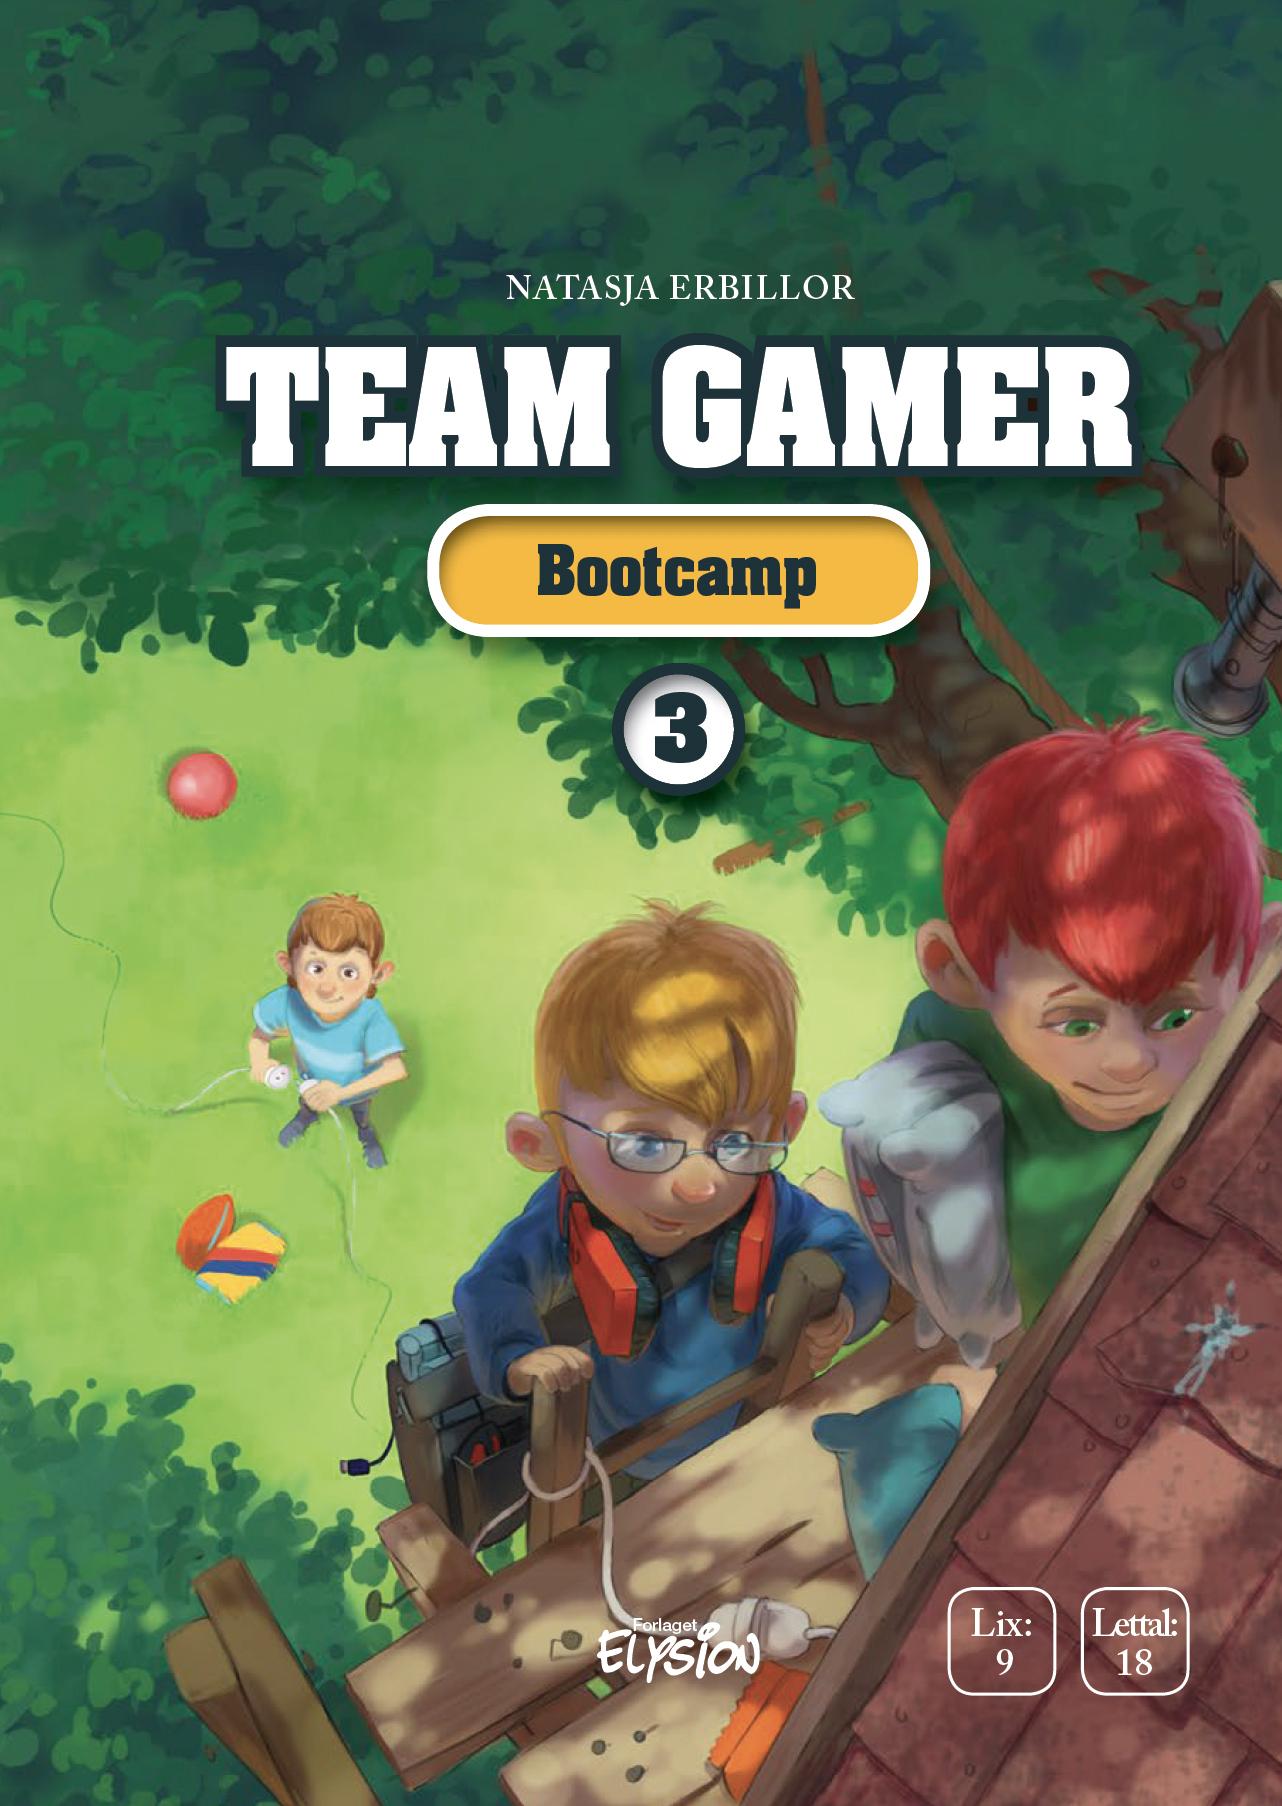 Team Gamer 3: Bootcamp - Natasja Erbillor - Bøger - Forlaget Elysion - 9788772146034 - January 16, 2020